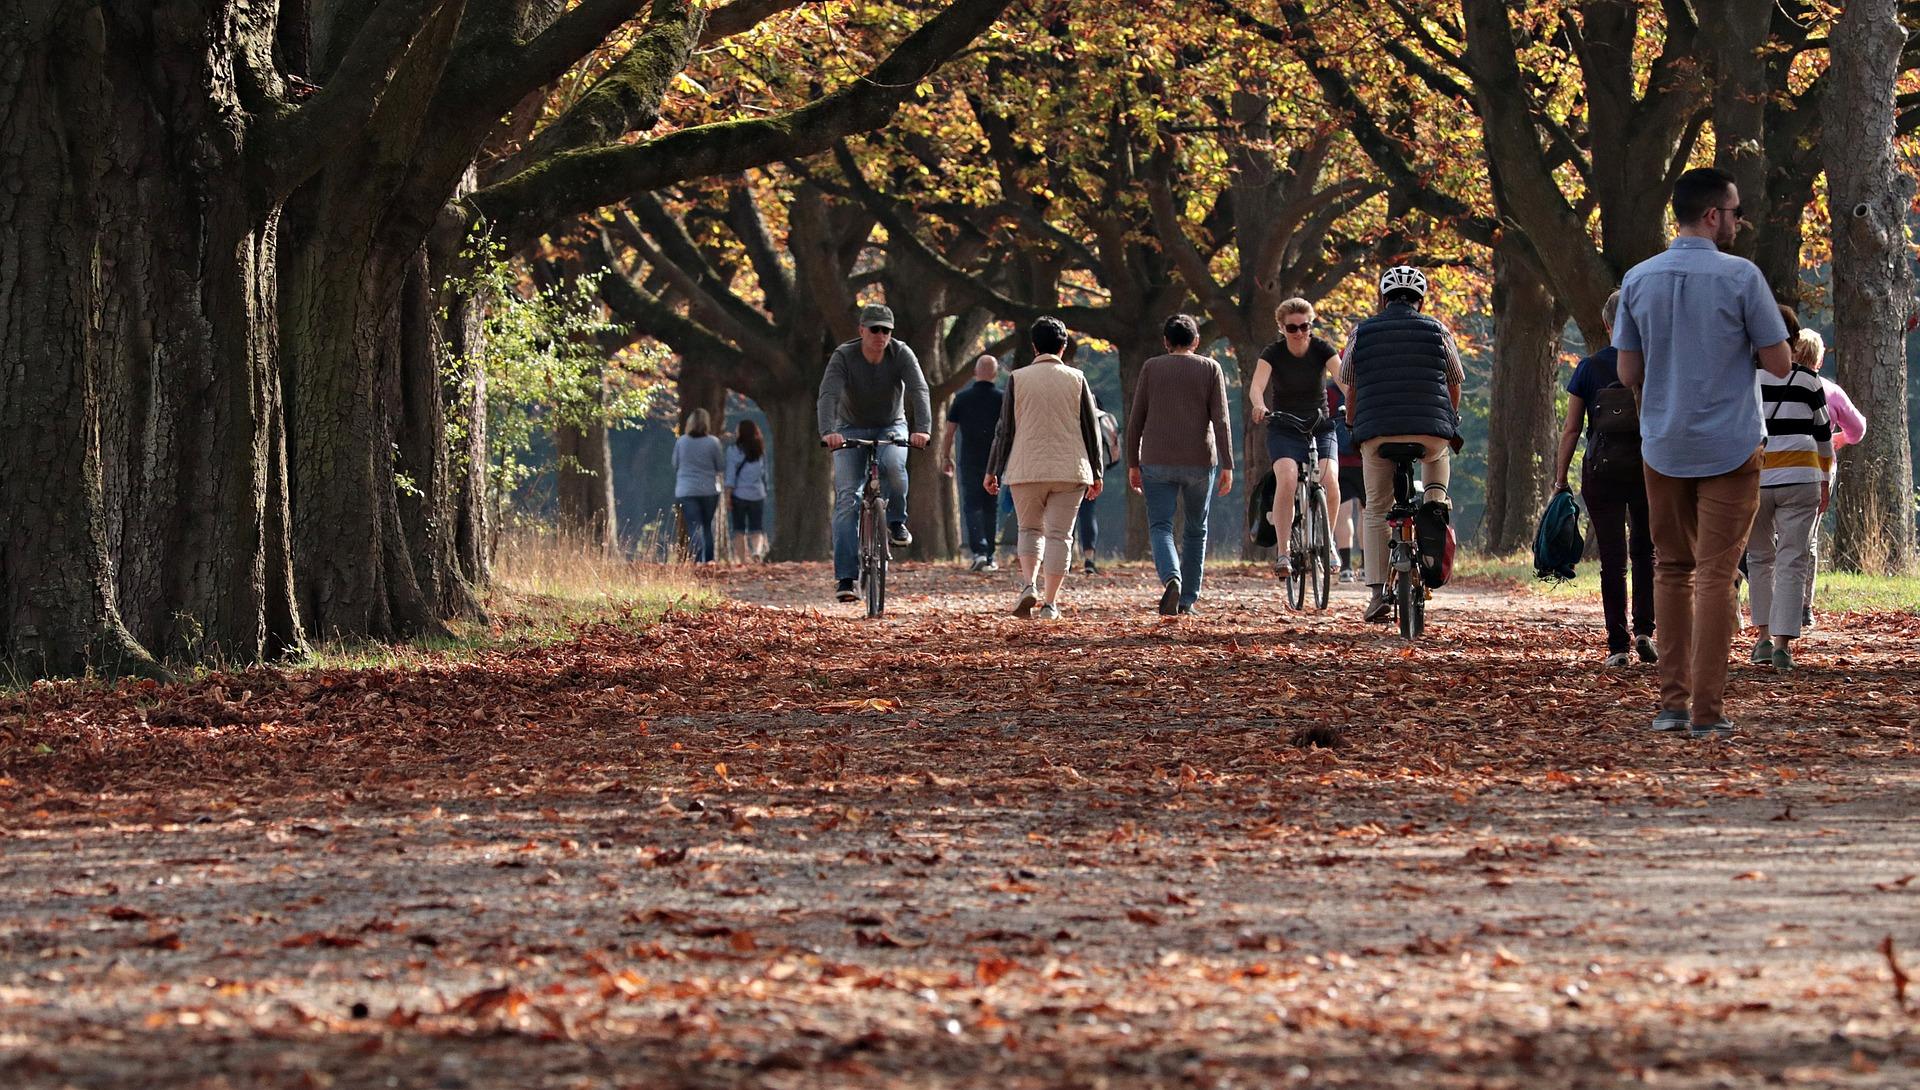 Spaziergang im Park